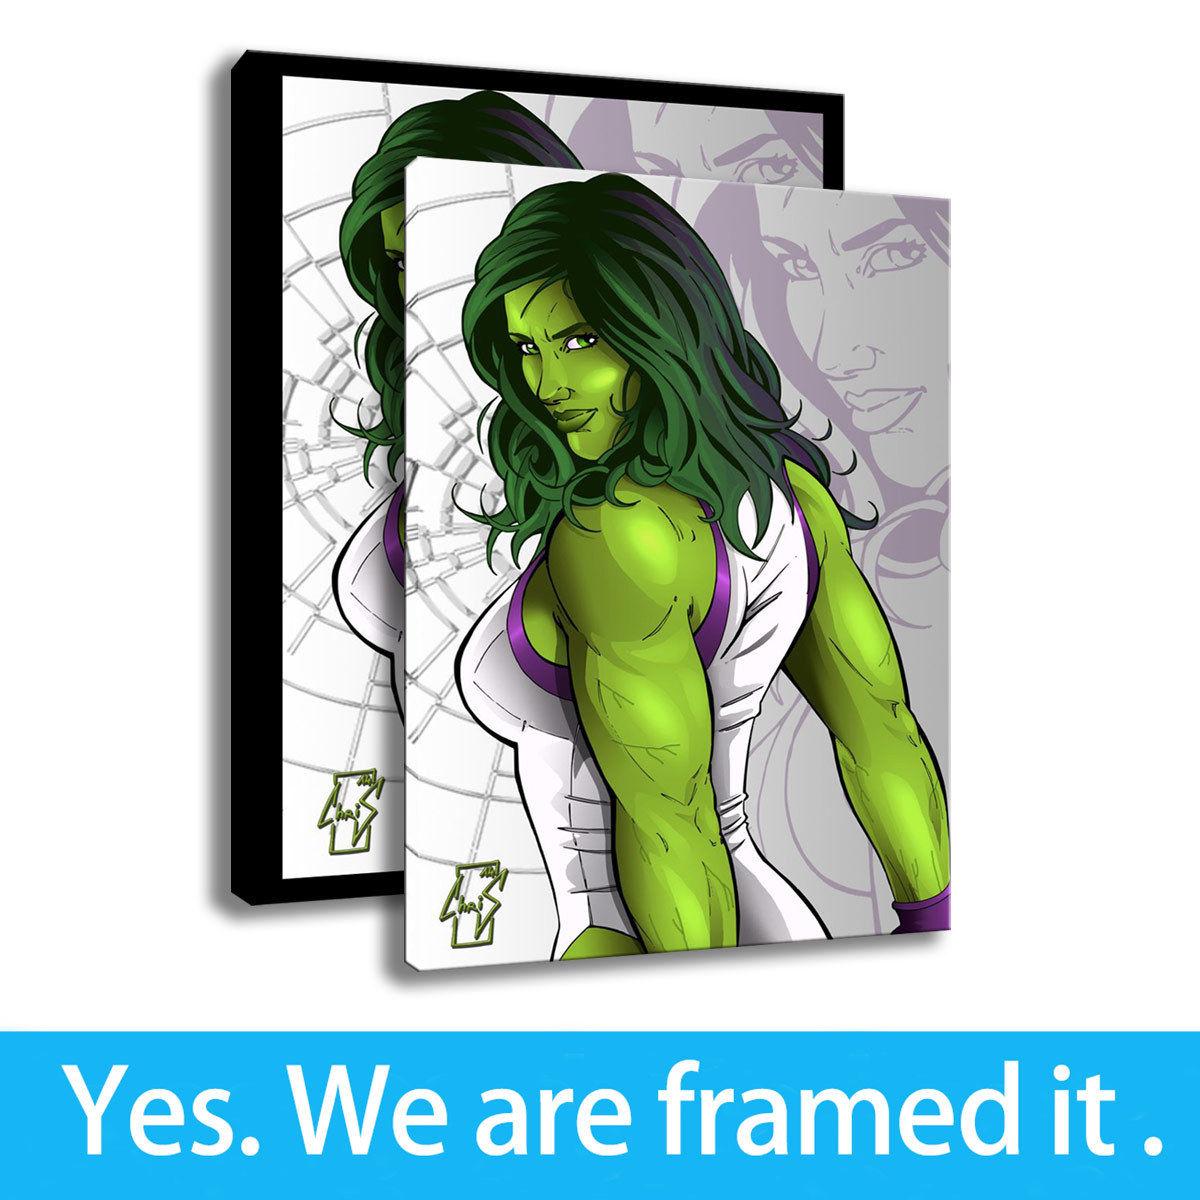 Art Oil Painting Print On Canvas Home Decor The She Hulk Framed